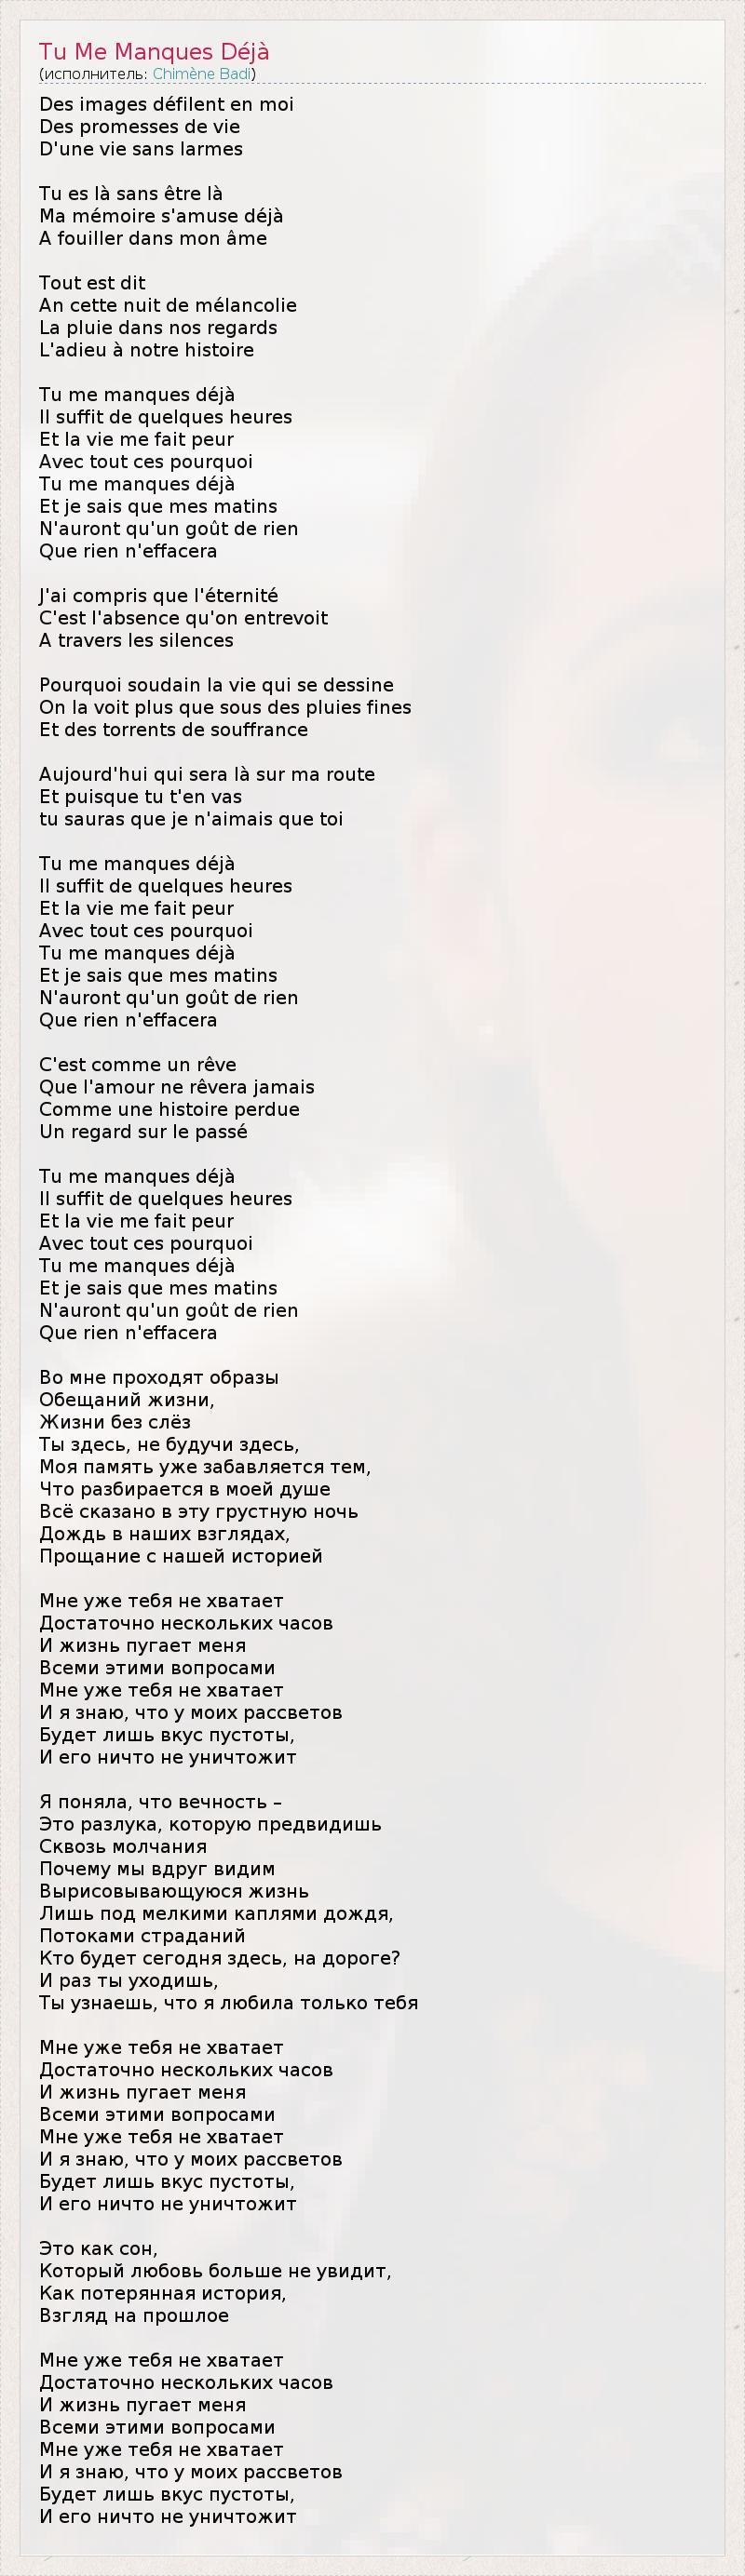 текст песни Tu Me Manques Déjà слова песни